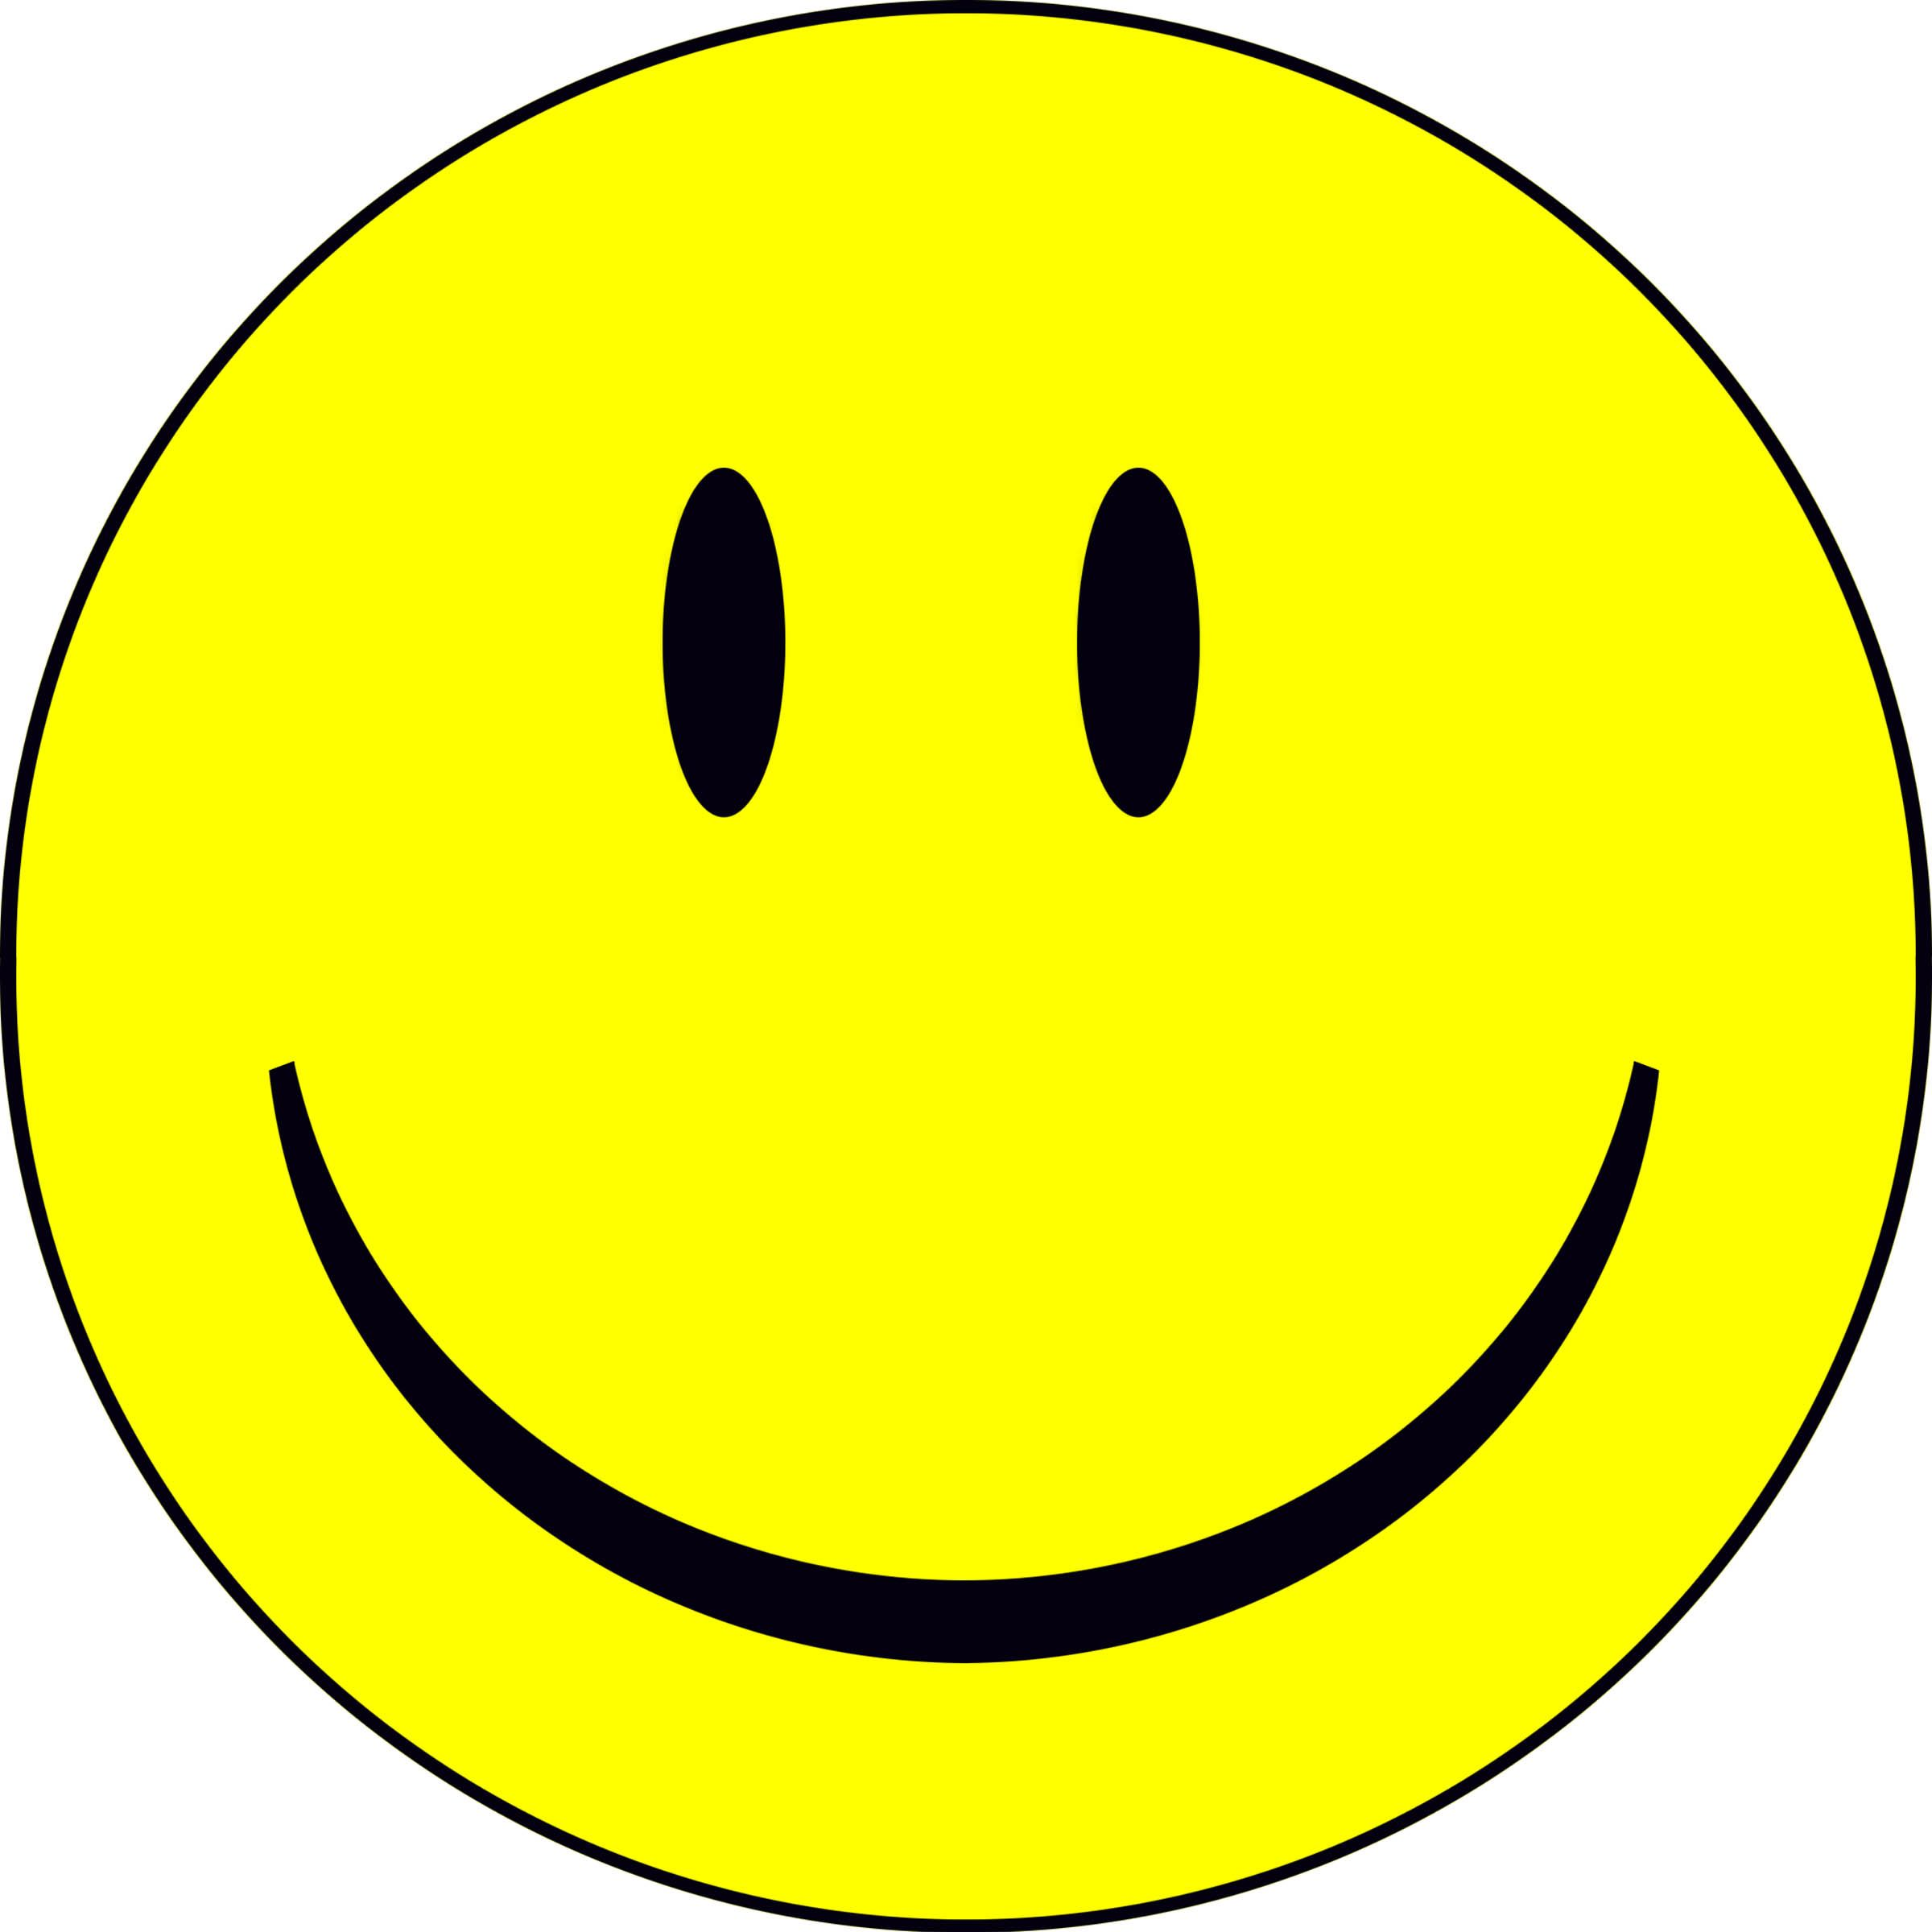 saudi arabia can t people detect the smile american bedu rh pinterest com Smiley Face Clip Art Border Cute Smiley Face Clip Art